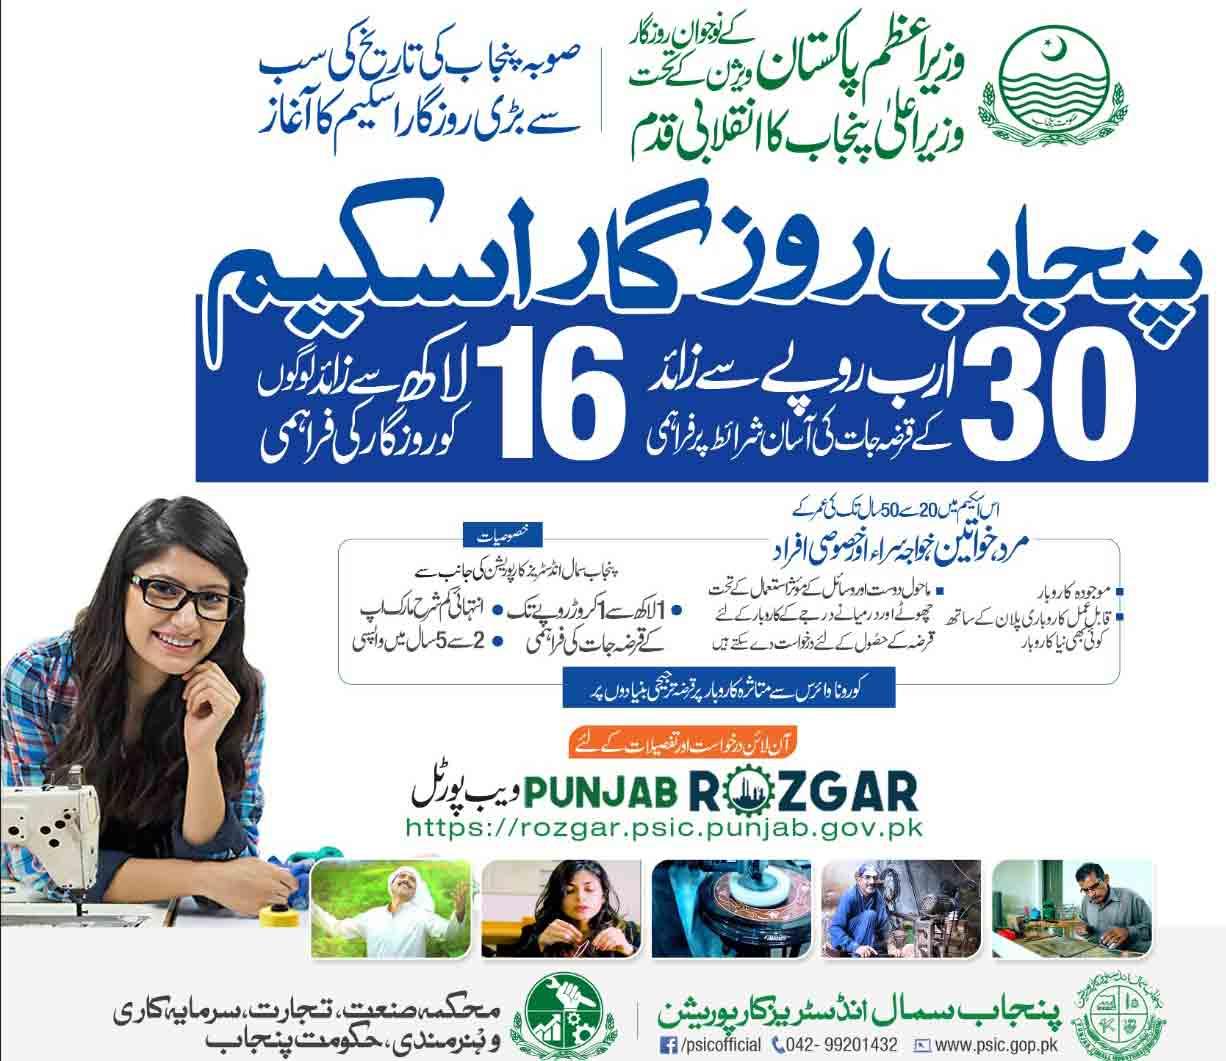 Punjab-Apna-Rozgar-Scheme-2020-Application-form